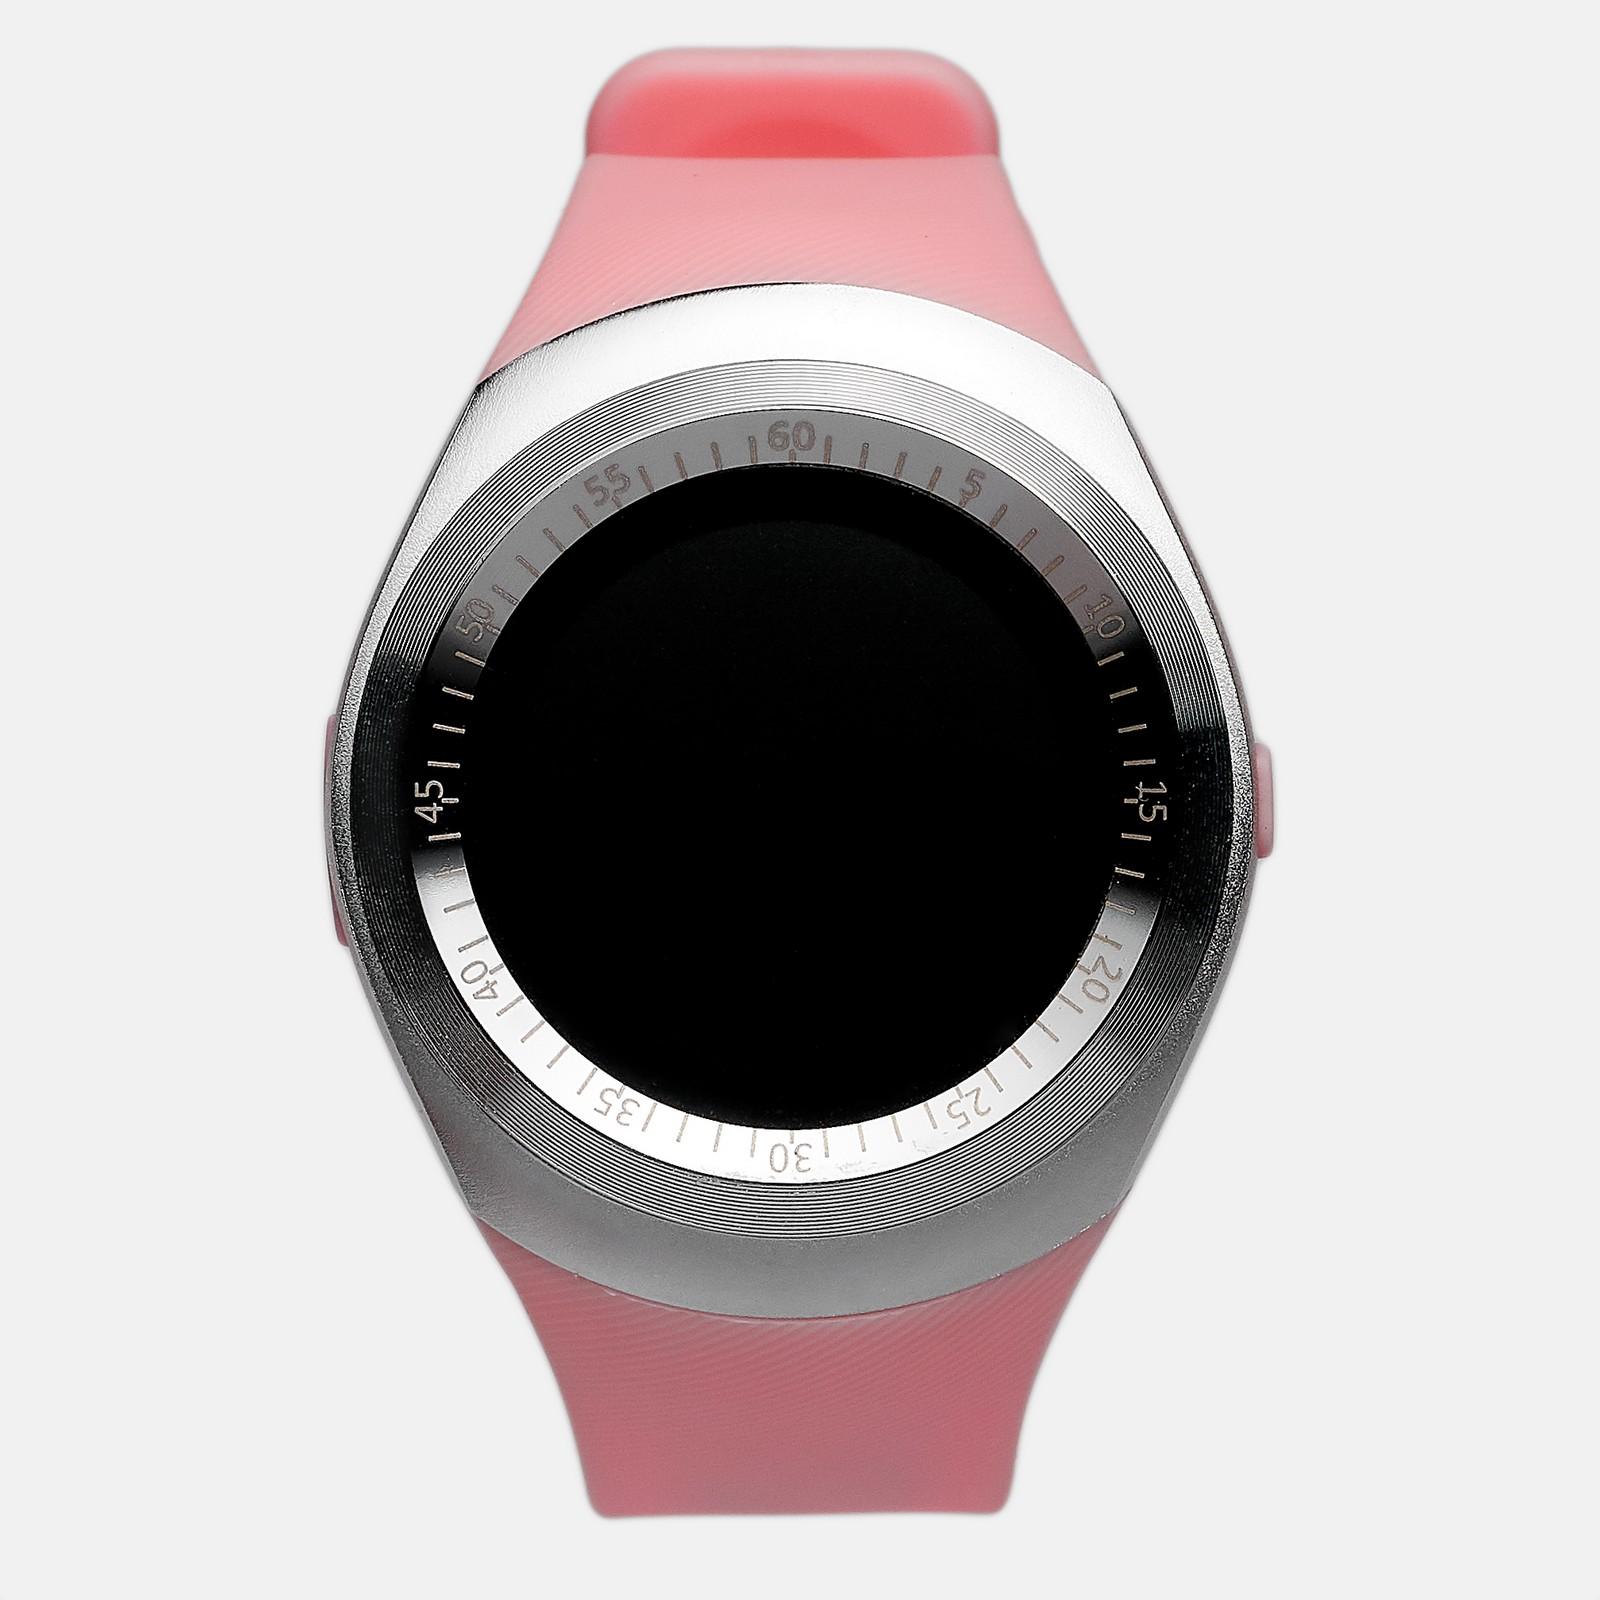 Умные часы Uwatch Y1 Pink